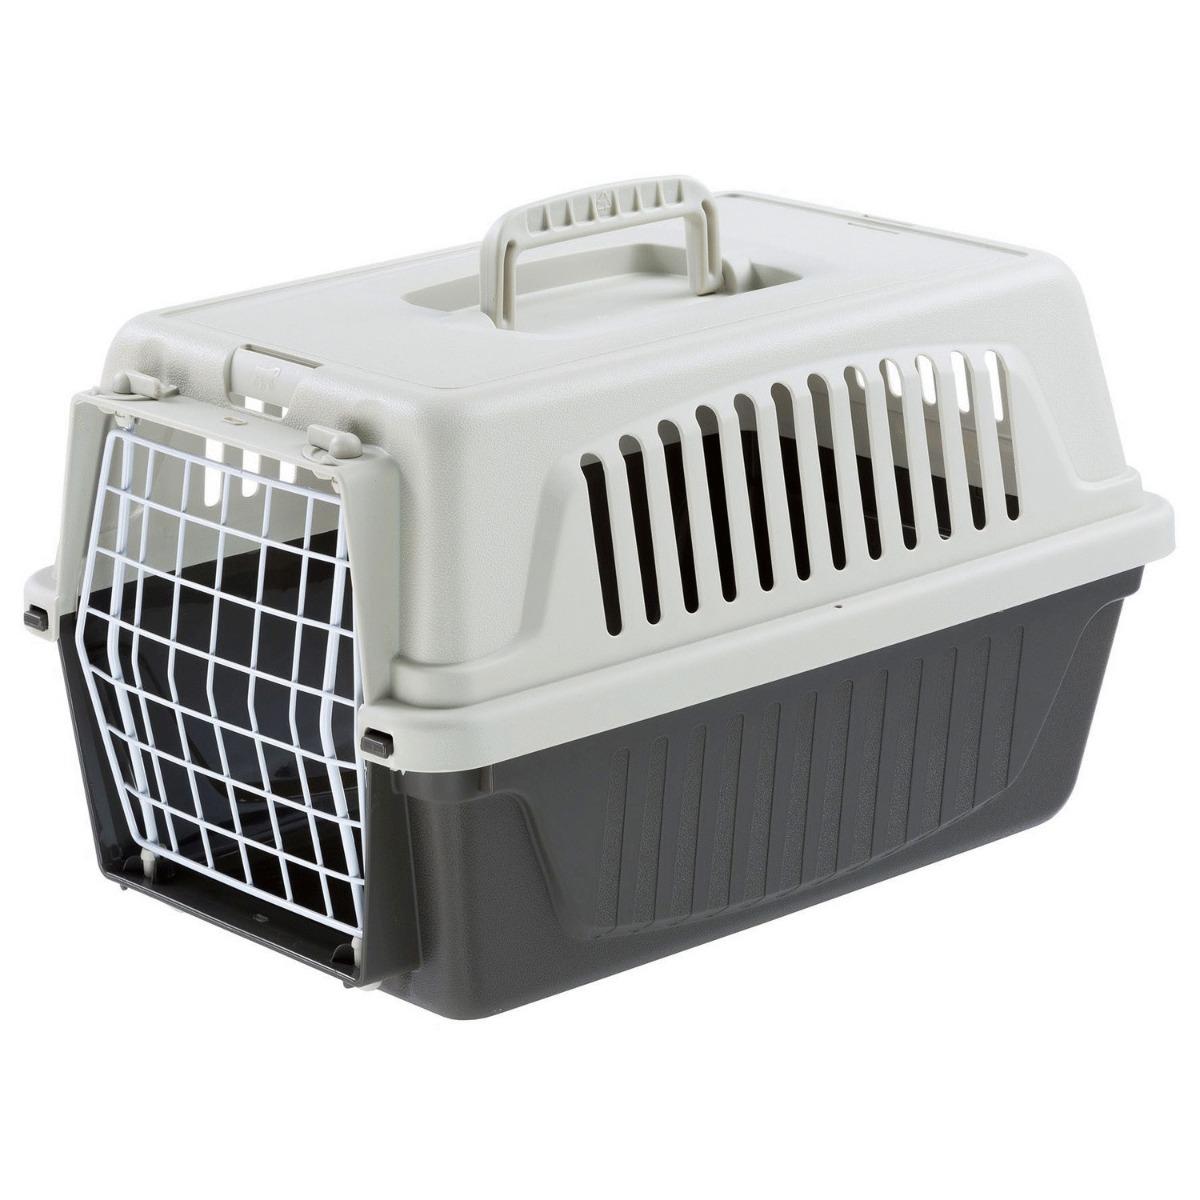 Ferplast Vervoersbox Atlas 5 28x41.5x24.5 cm Kattenvervoersbox Grijs